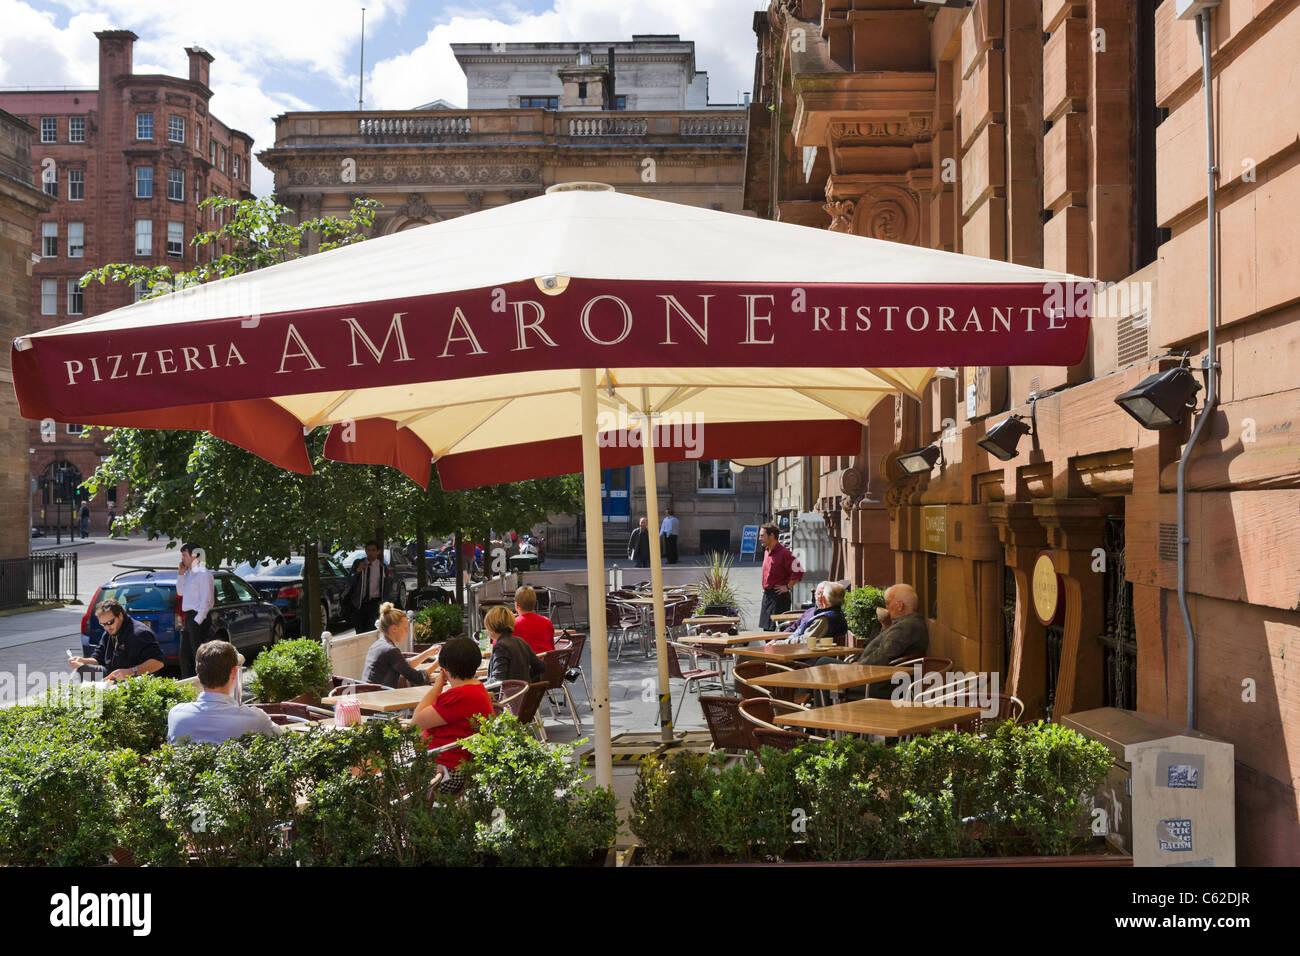 Restaurant on Buchanan Street in the city centre, Glasgow, Scotland, UK - Stock Image